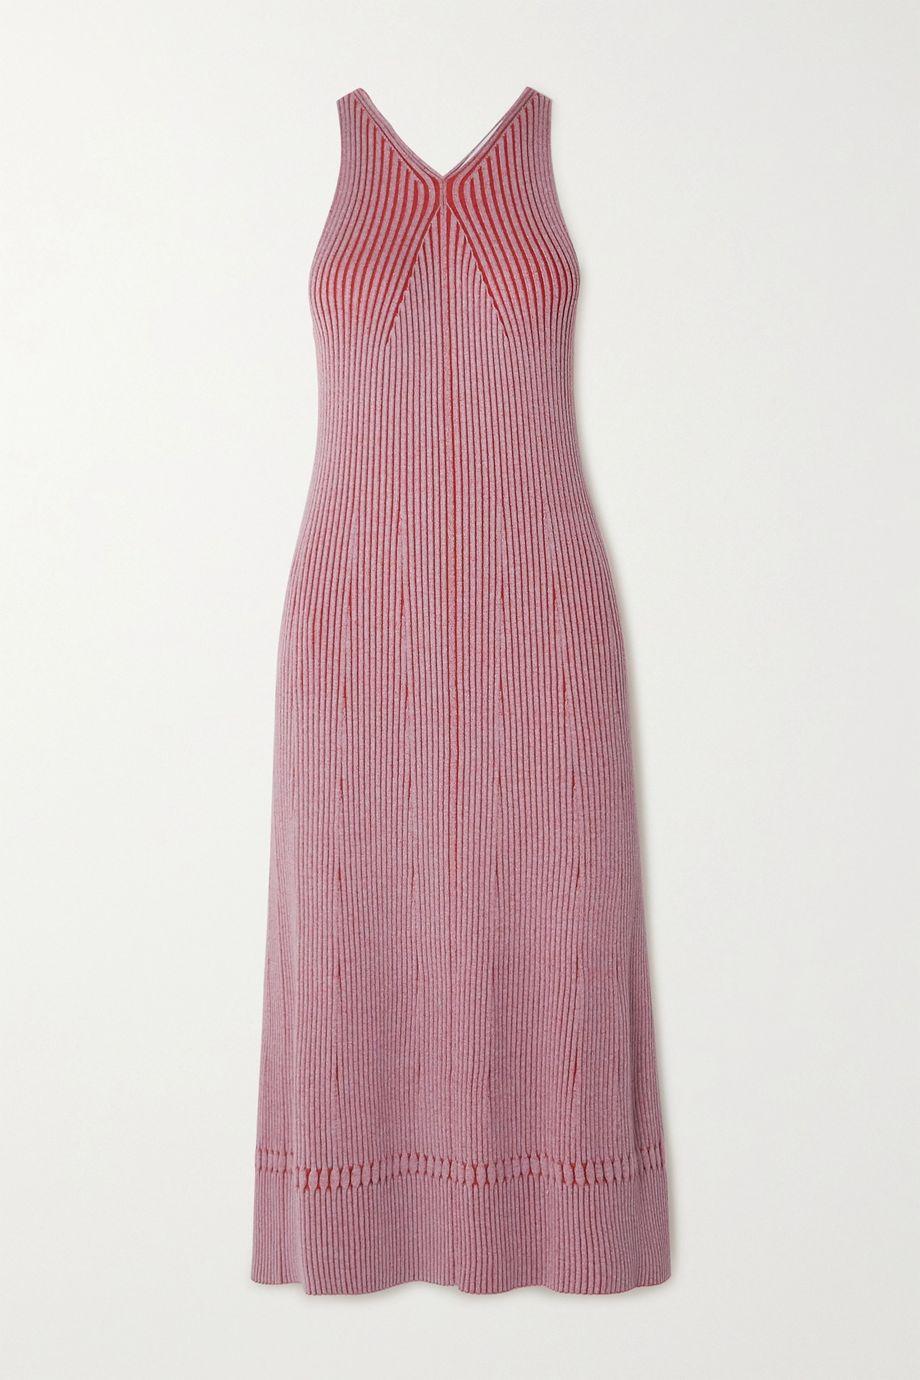 Proenza Schouler White Label Ribbed-knit midi dress